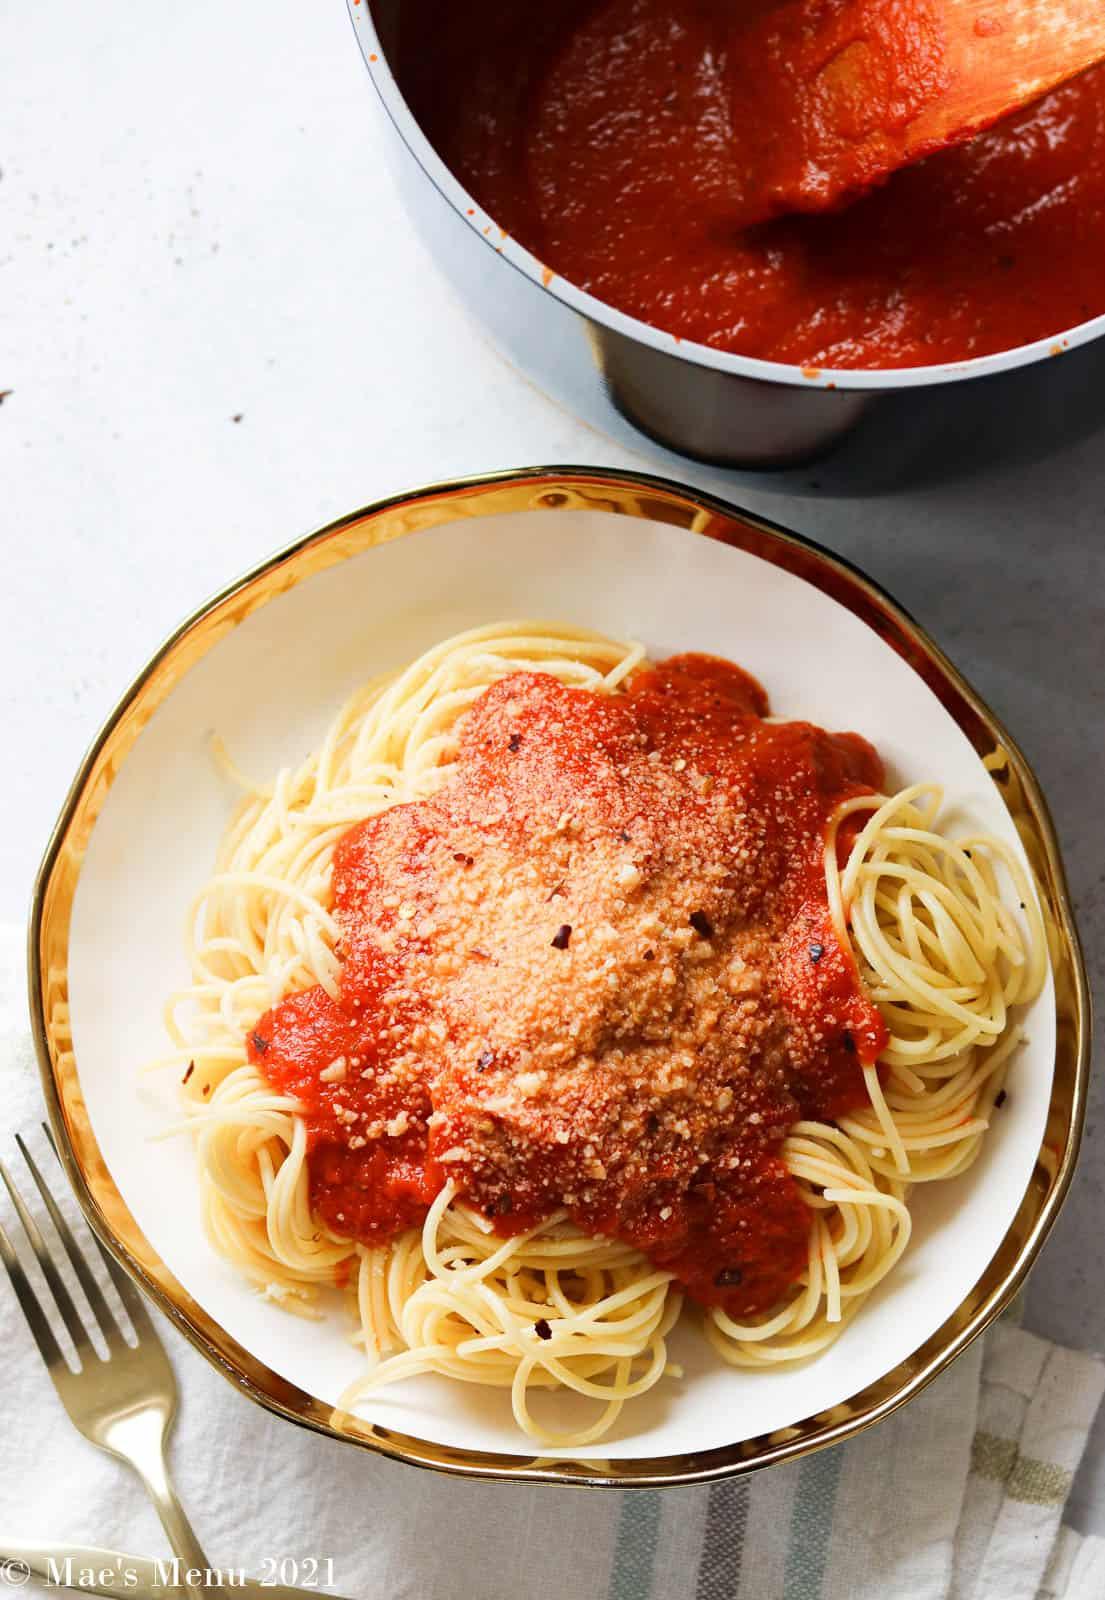 An overhead shot of a bowl of pasta with homemade marinara sauce.